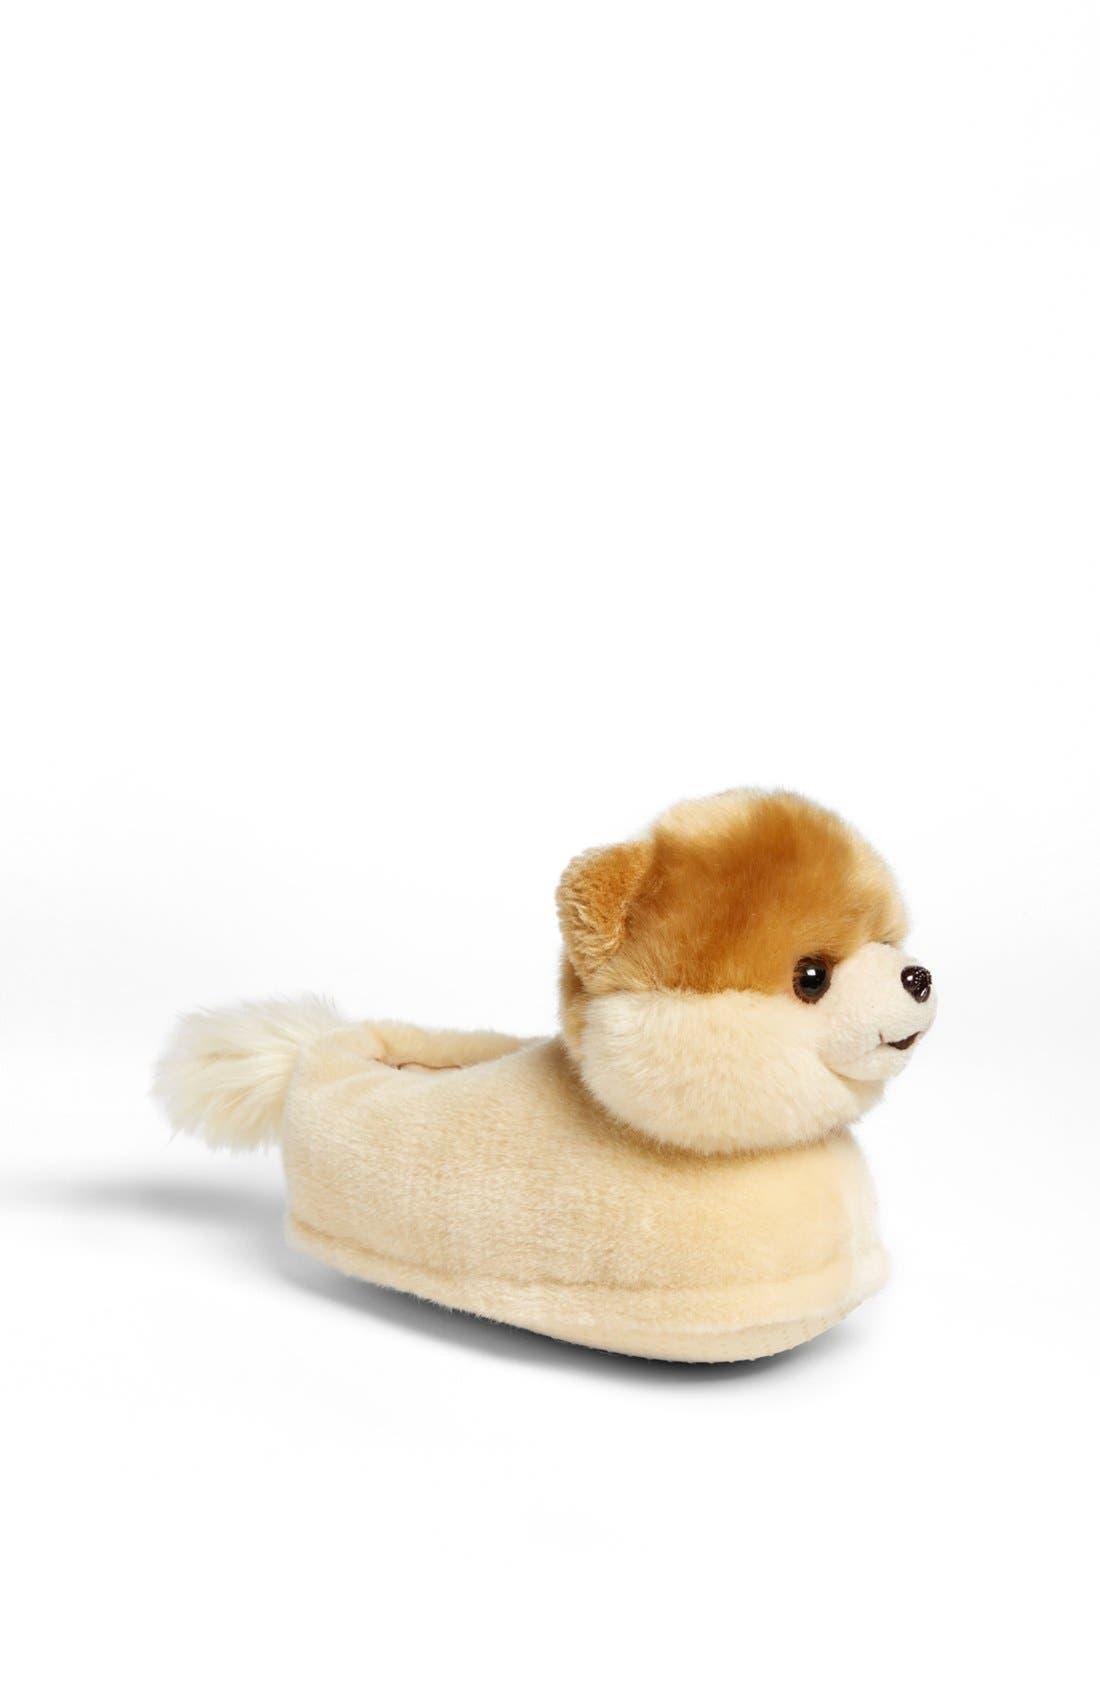 SG FOOTWEAR 'Boo - The World's Cutest Dog' Slipper, Main, color, 200